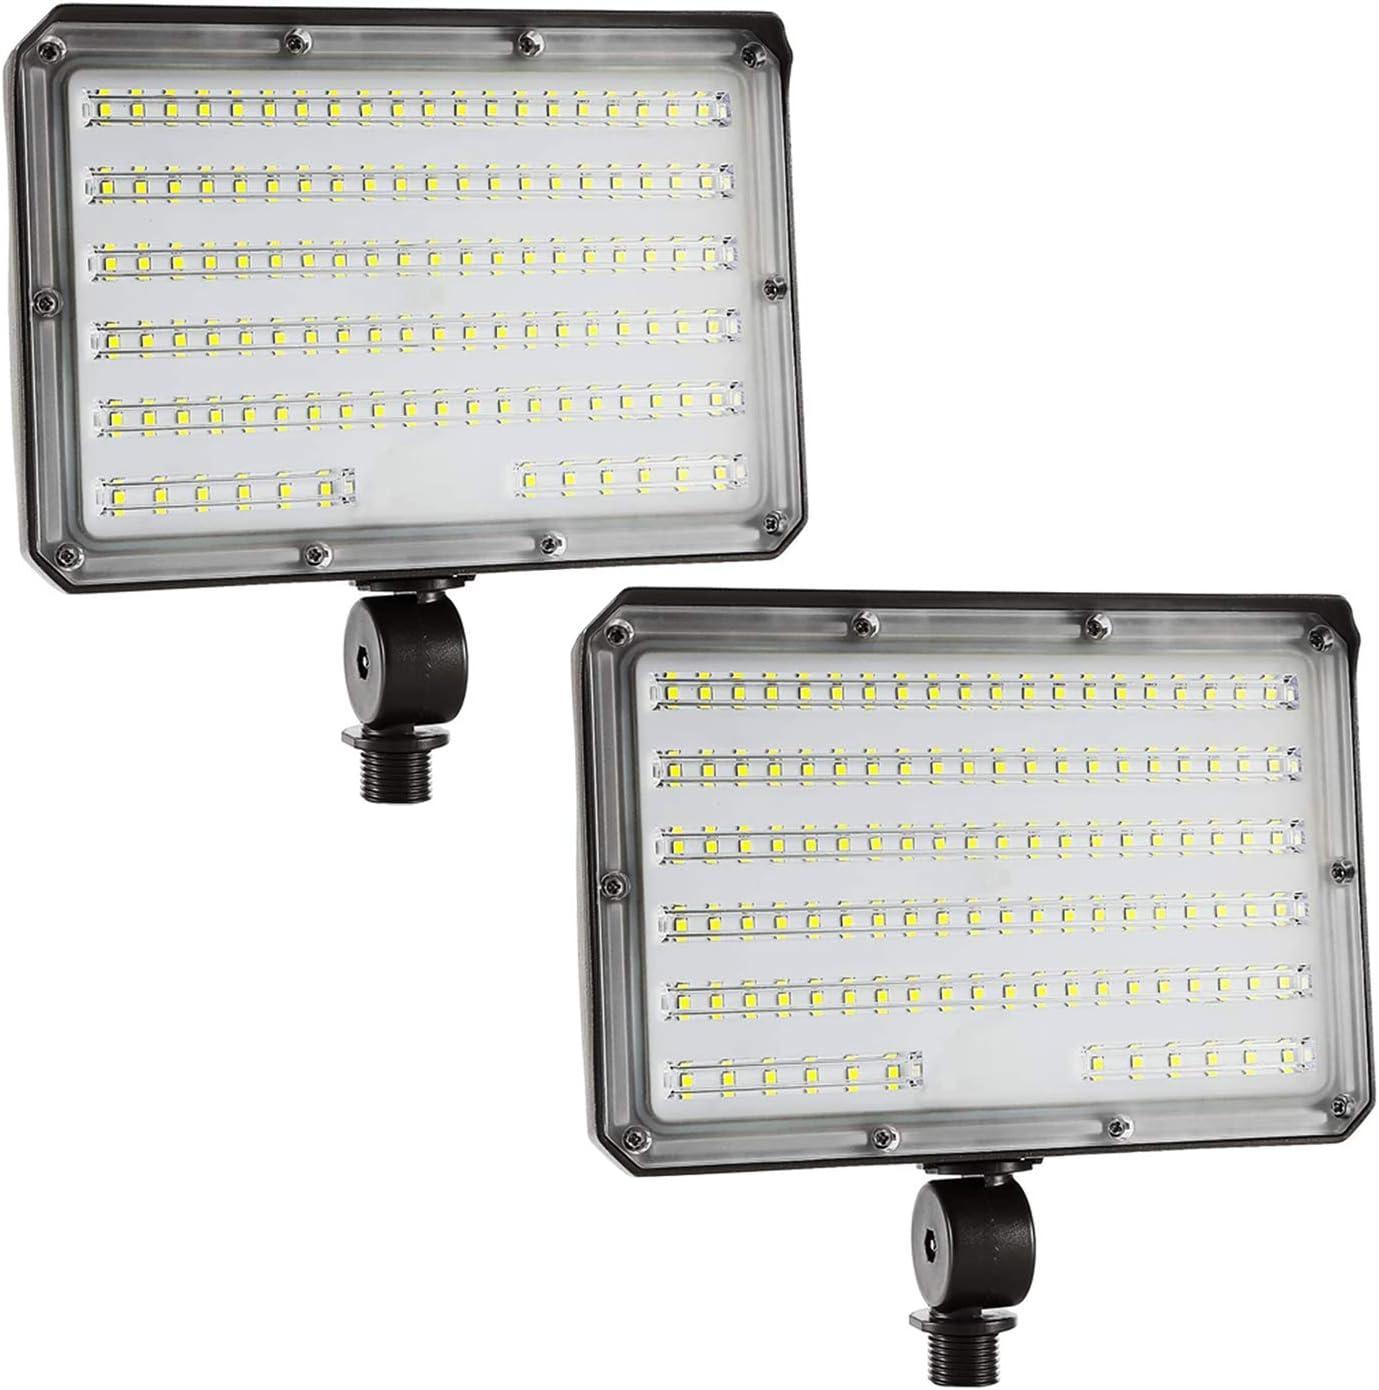 80W LED Flood Light Outdoor with Knuckle Super sale Mount Lights Max 41% OFF